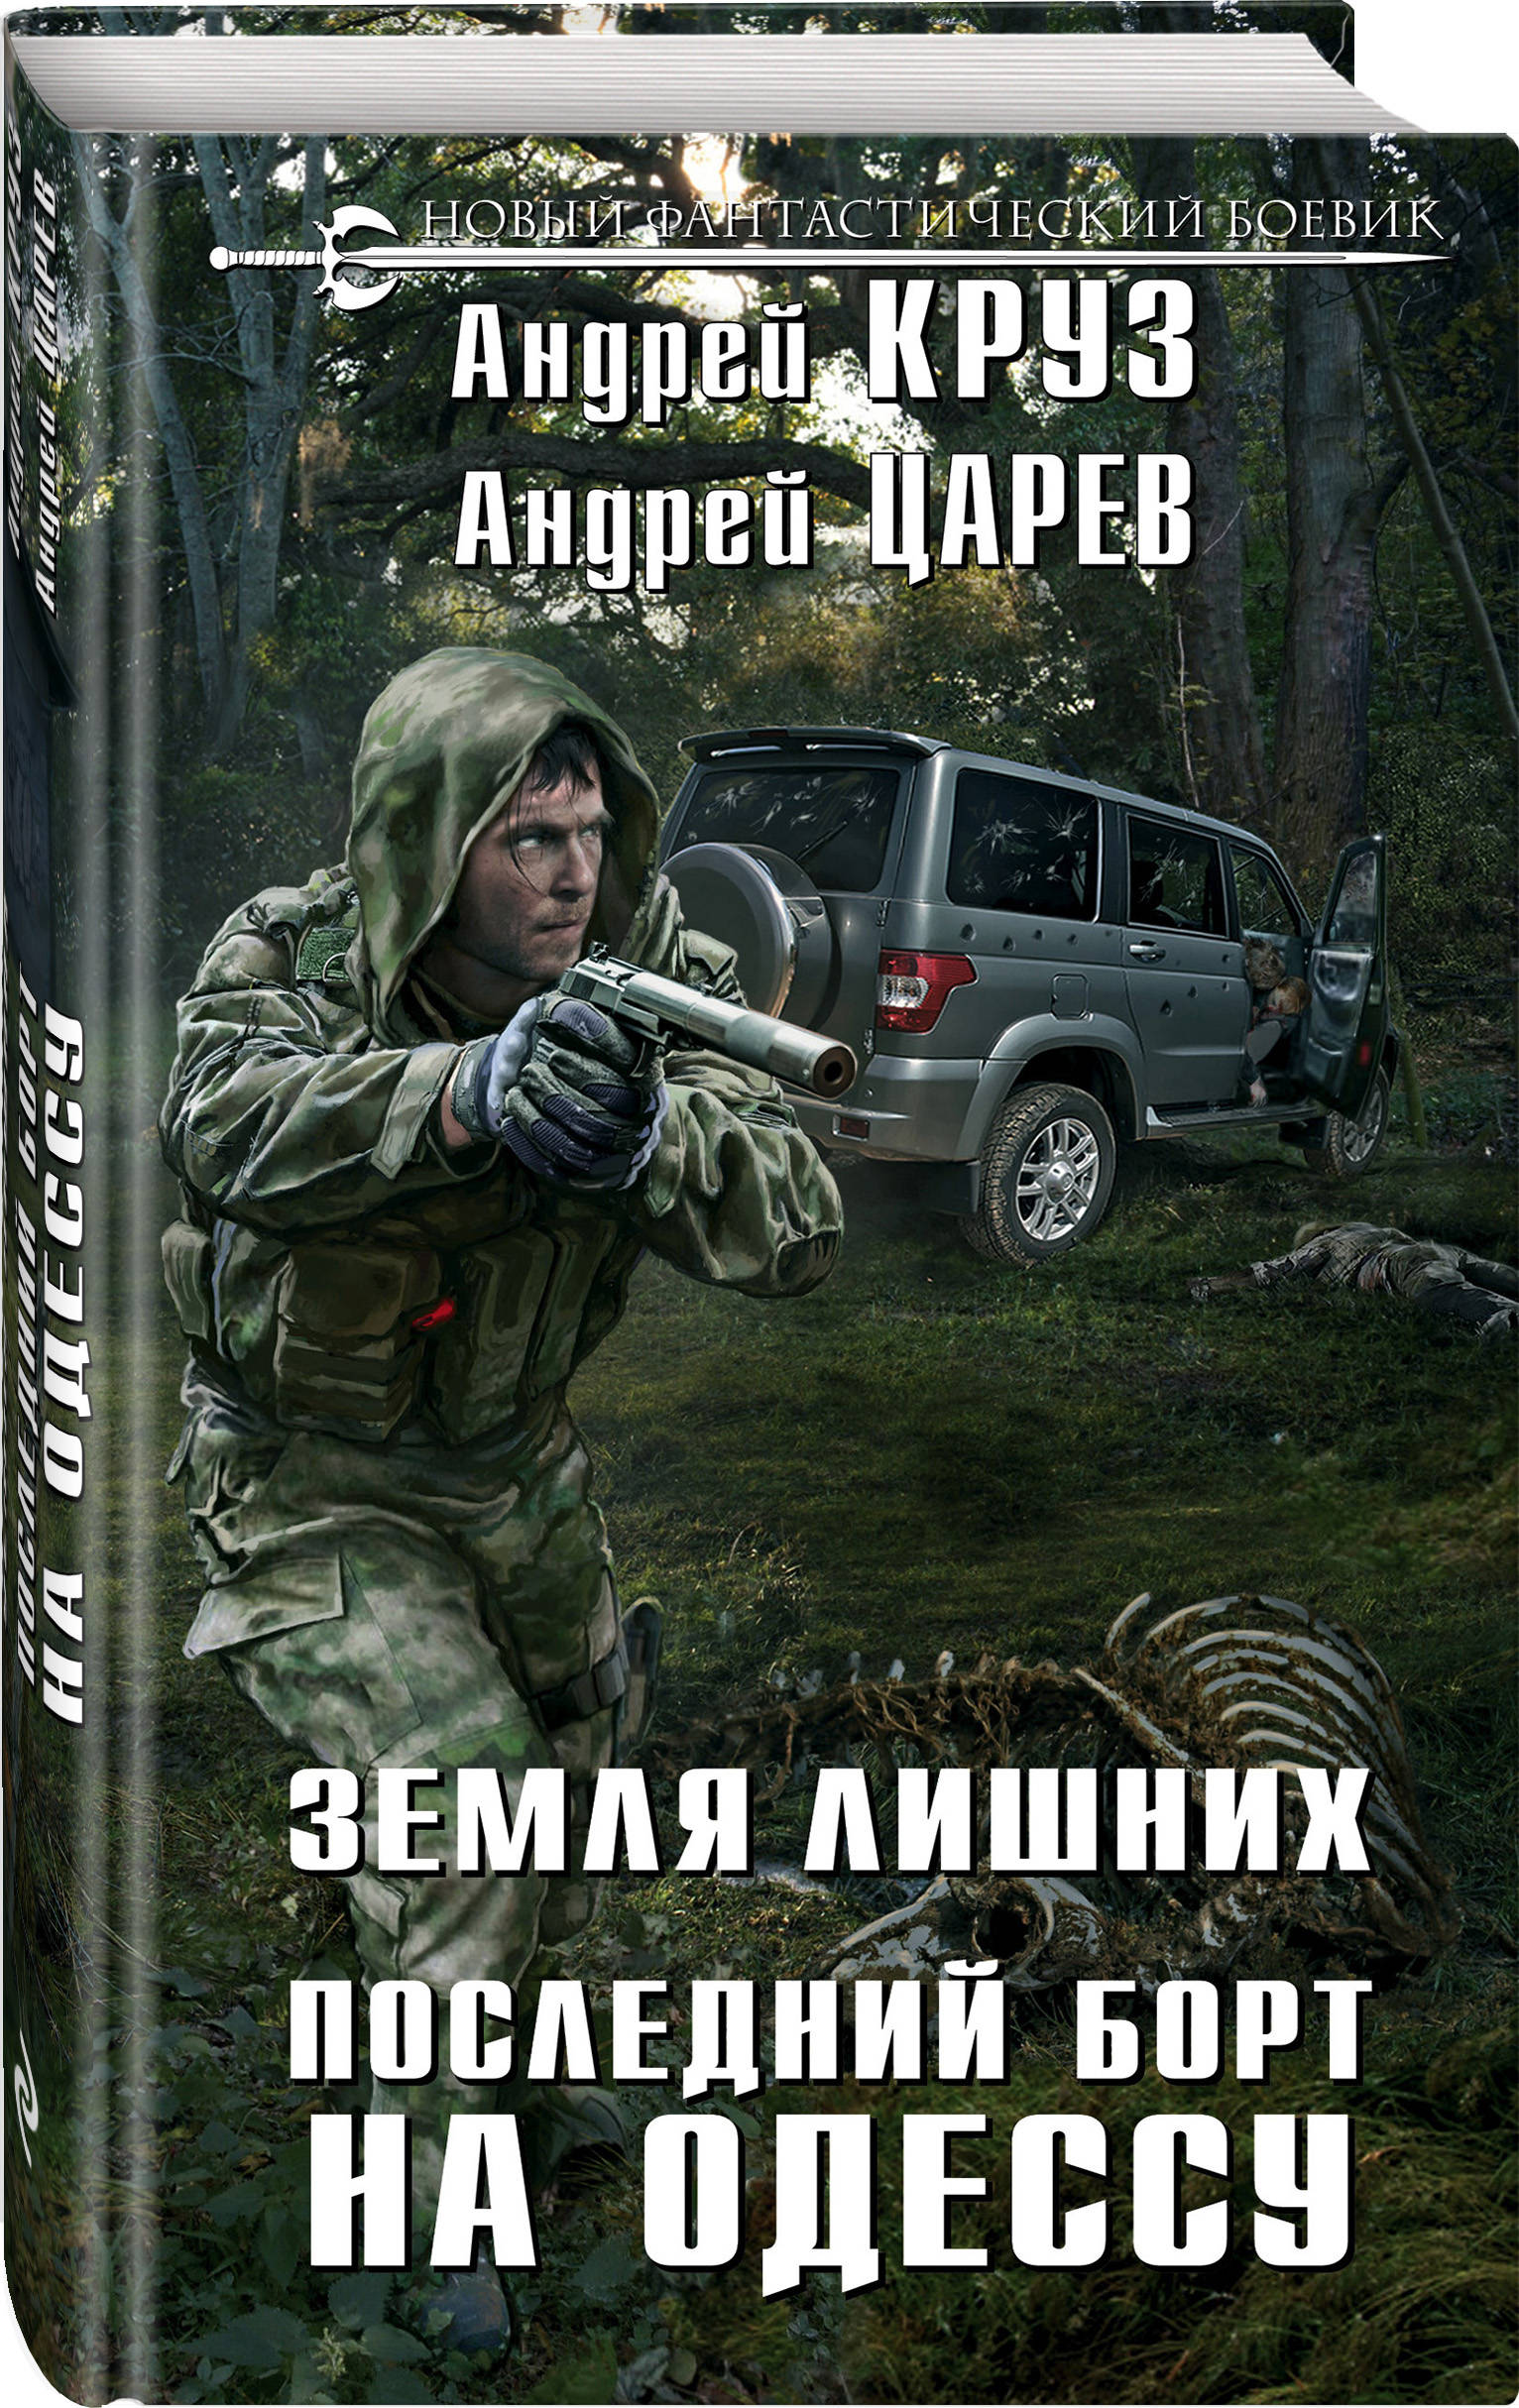 все цены на Андрей Круз, Андрей Царев Земля Лишних. Последний борт на Одессу онлайн